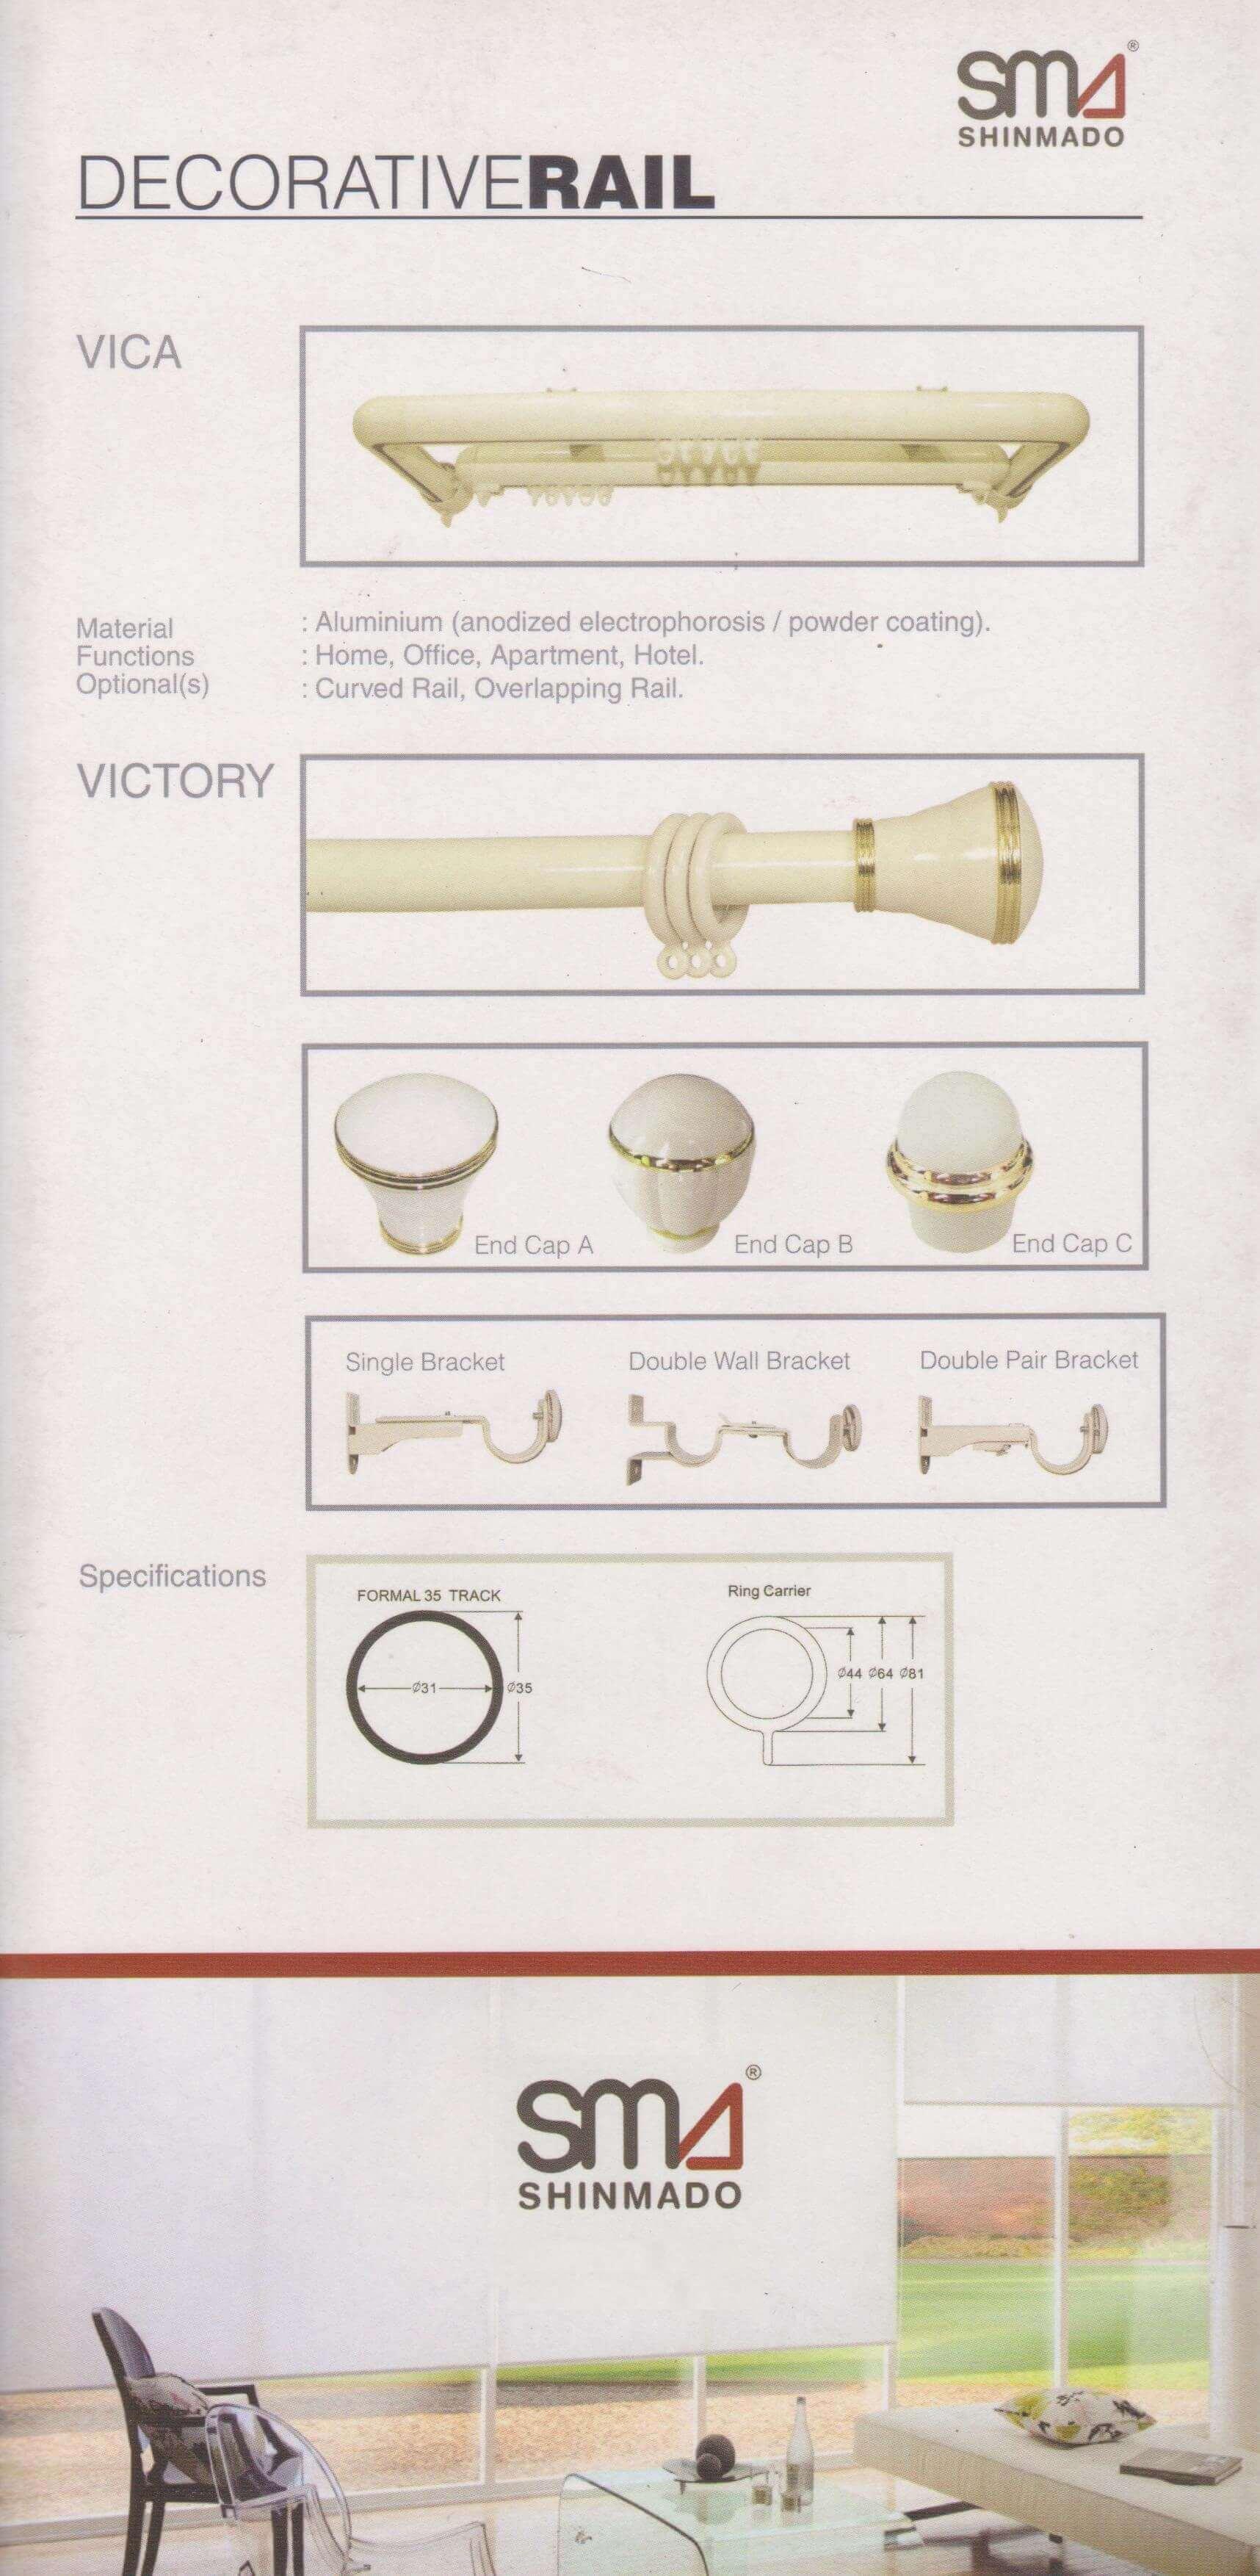 Shinmado Vica Victory decorative rail